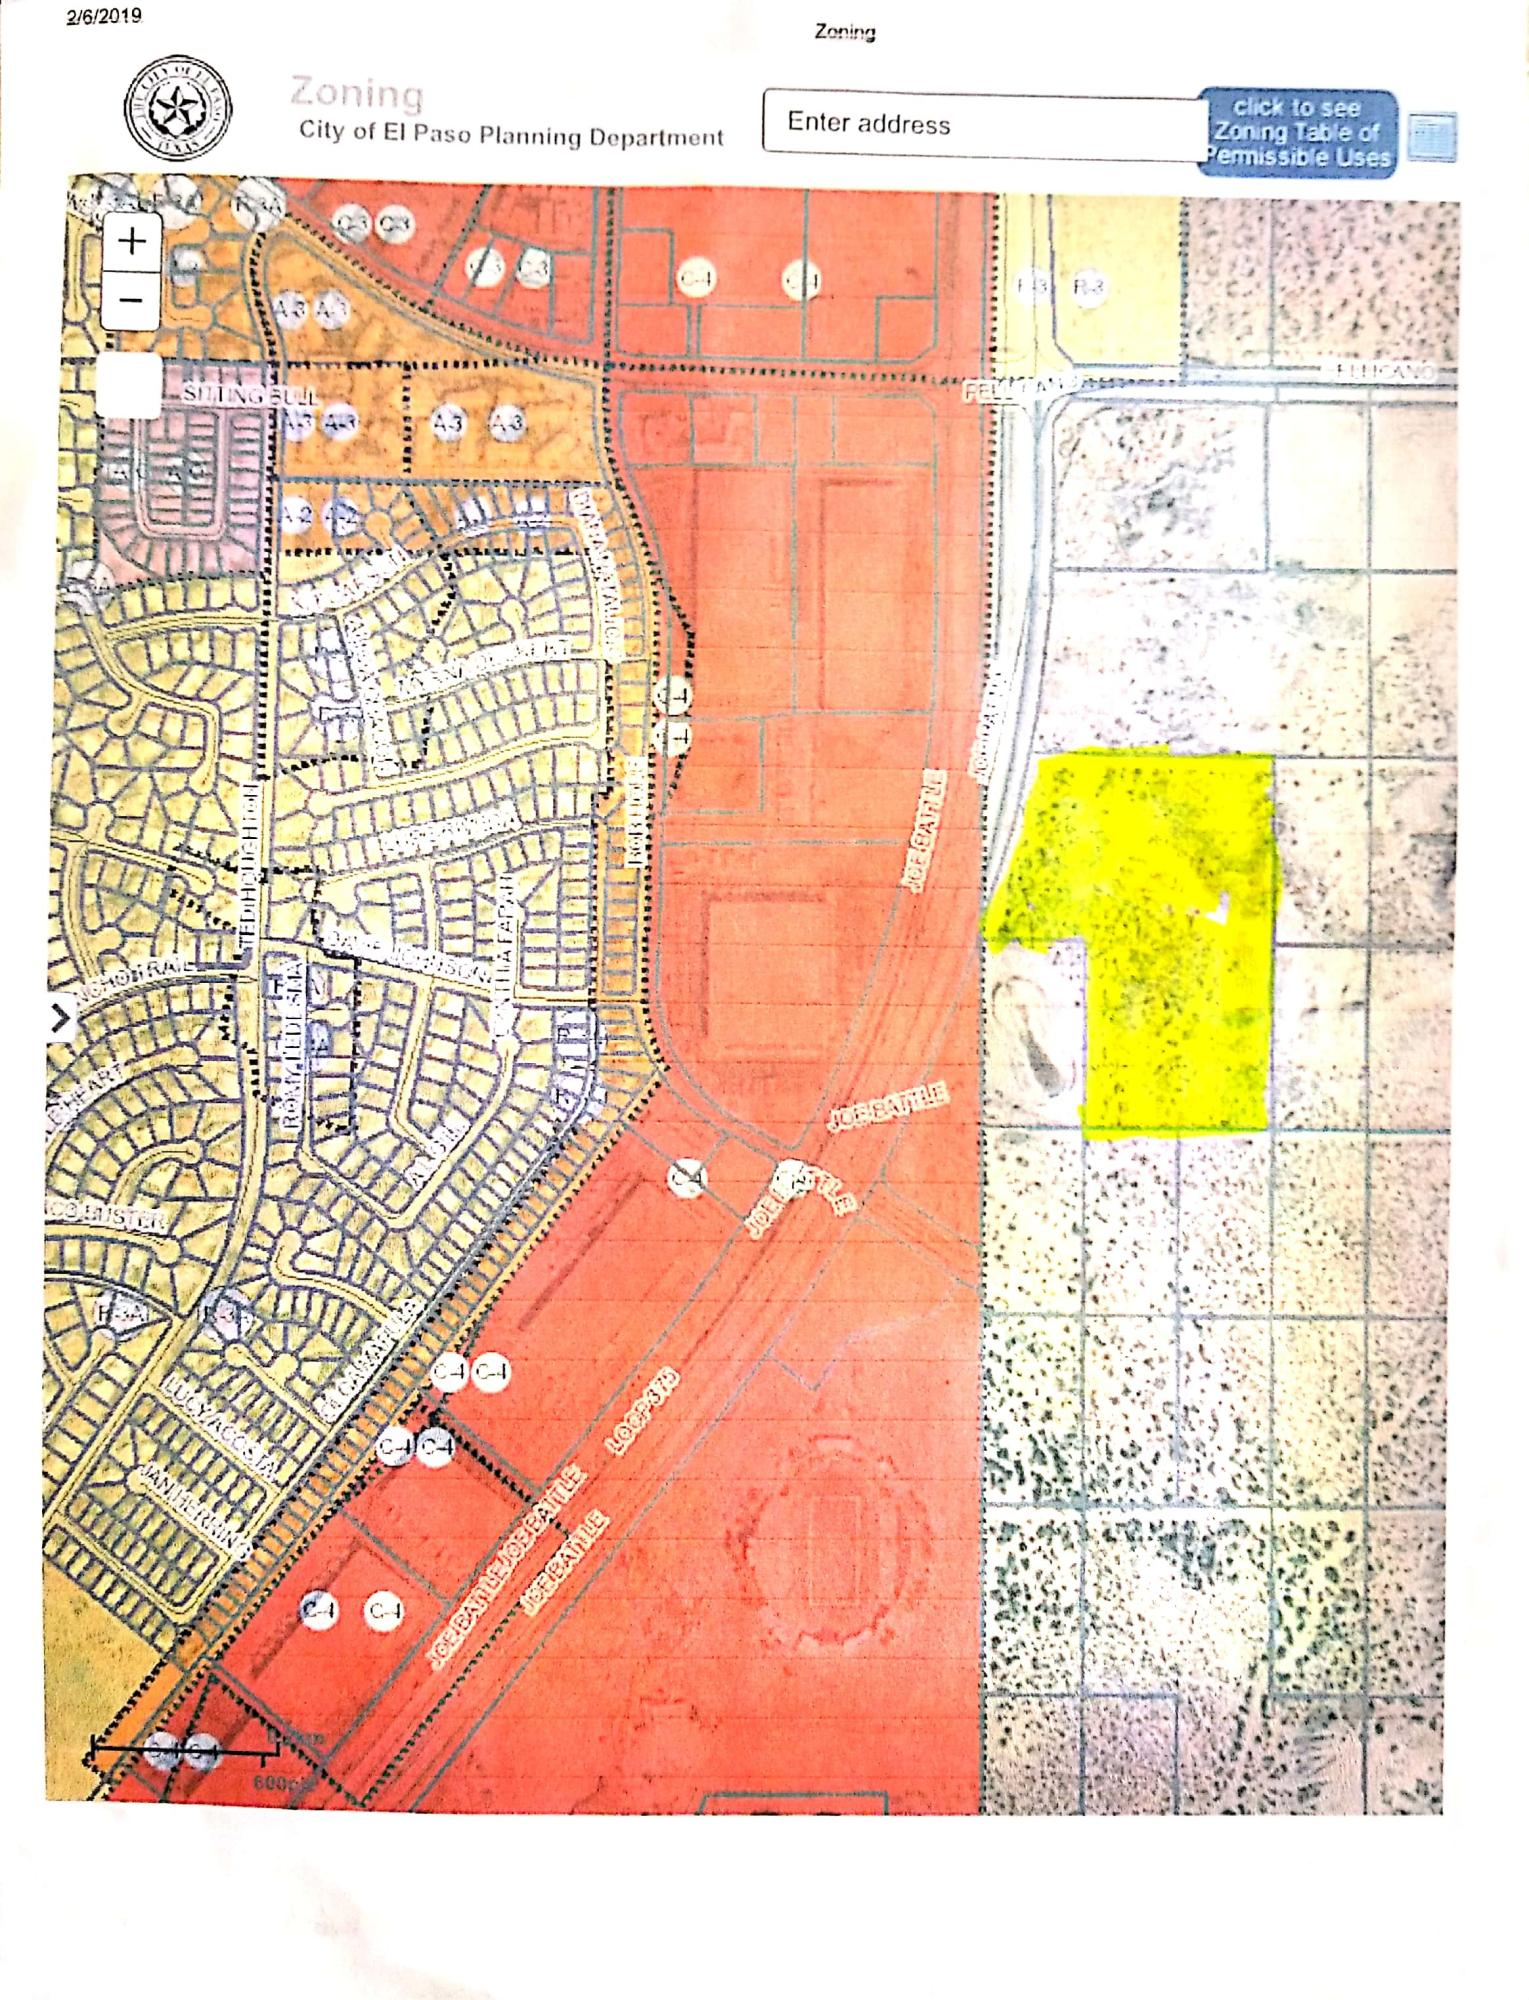 1 JOE BATTLE Boulevard, El Paso, Texas 79936, ,Land,For sale,JOE BATTLE,809404